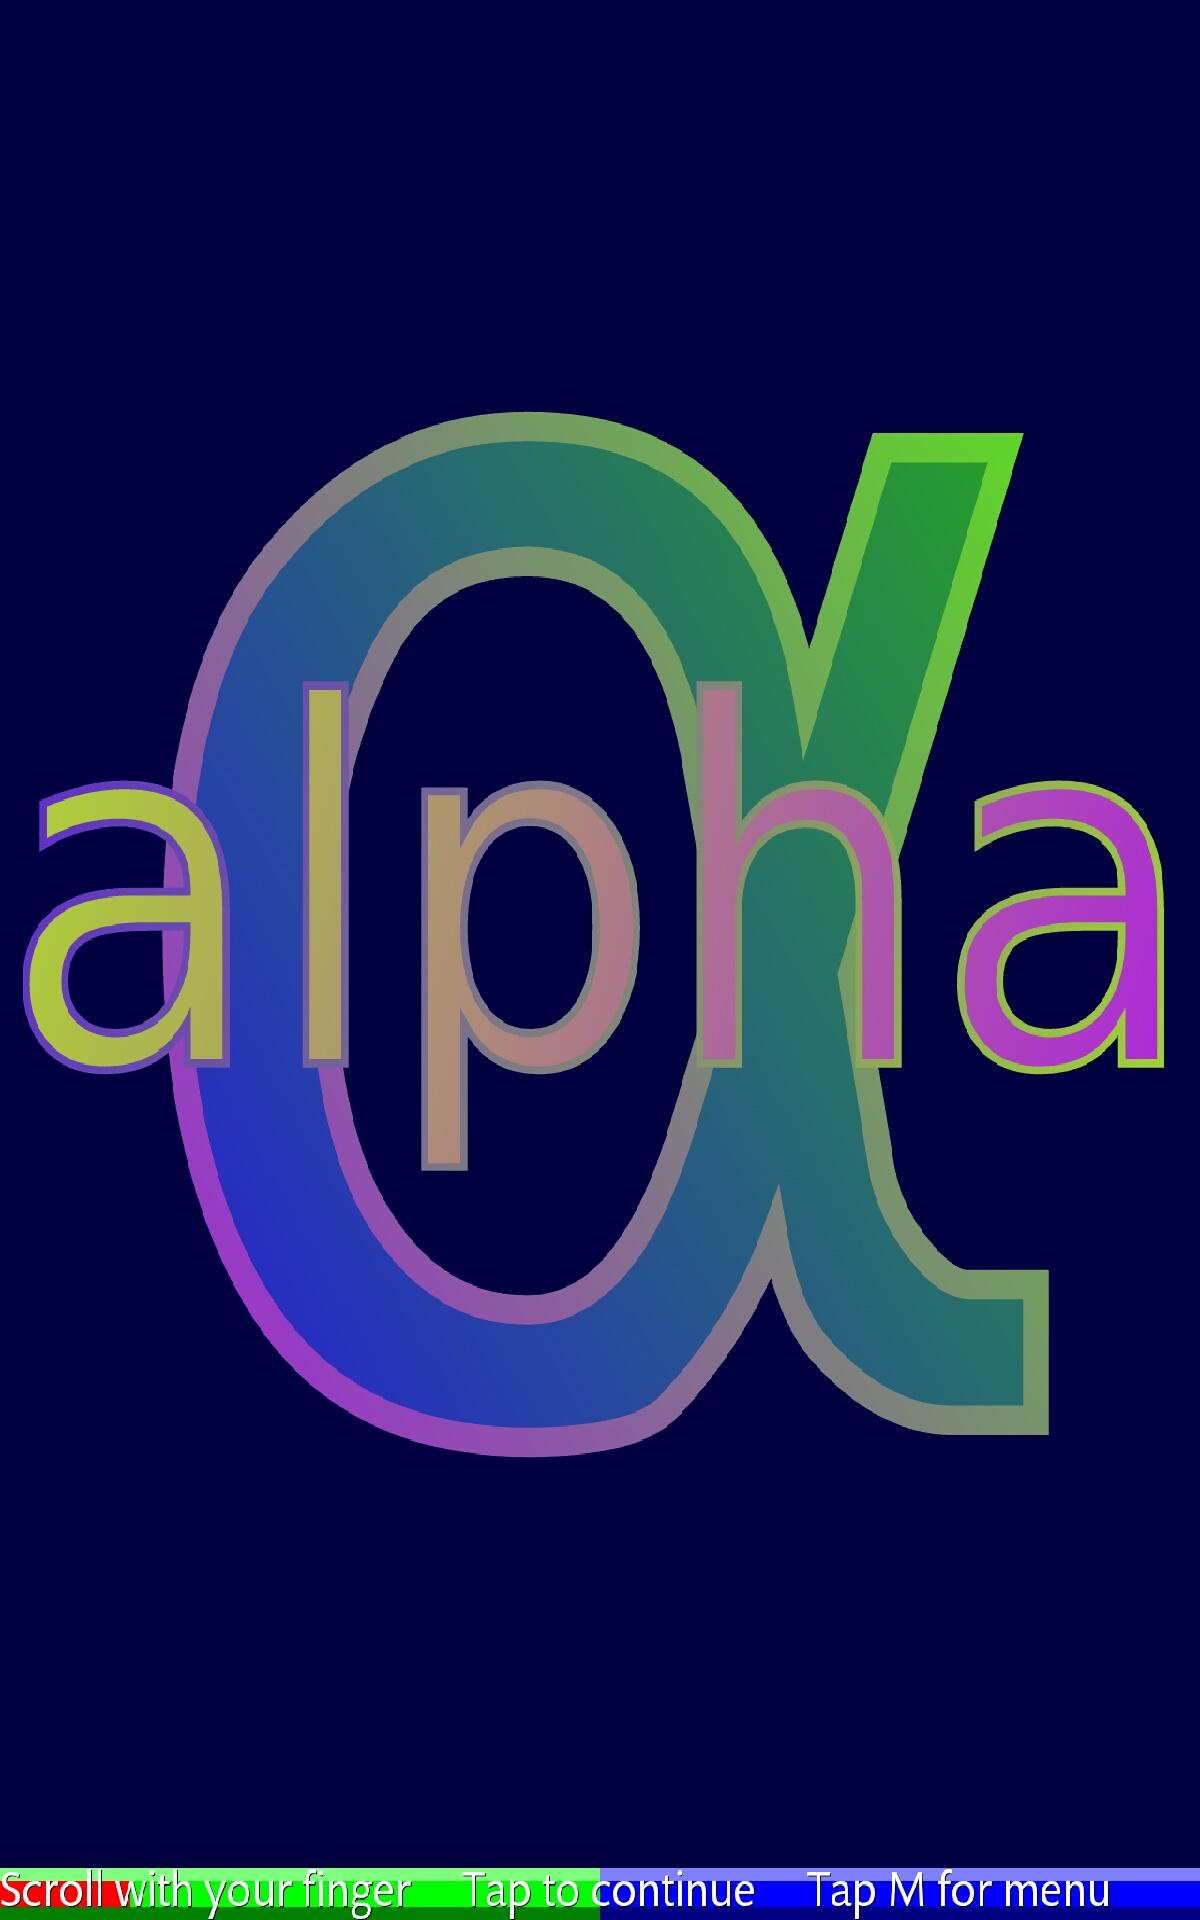 As letras do alfabeto grego: Amazon.com.br: Amazon Appstore